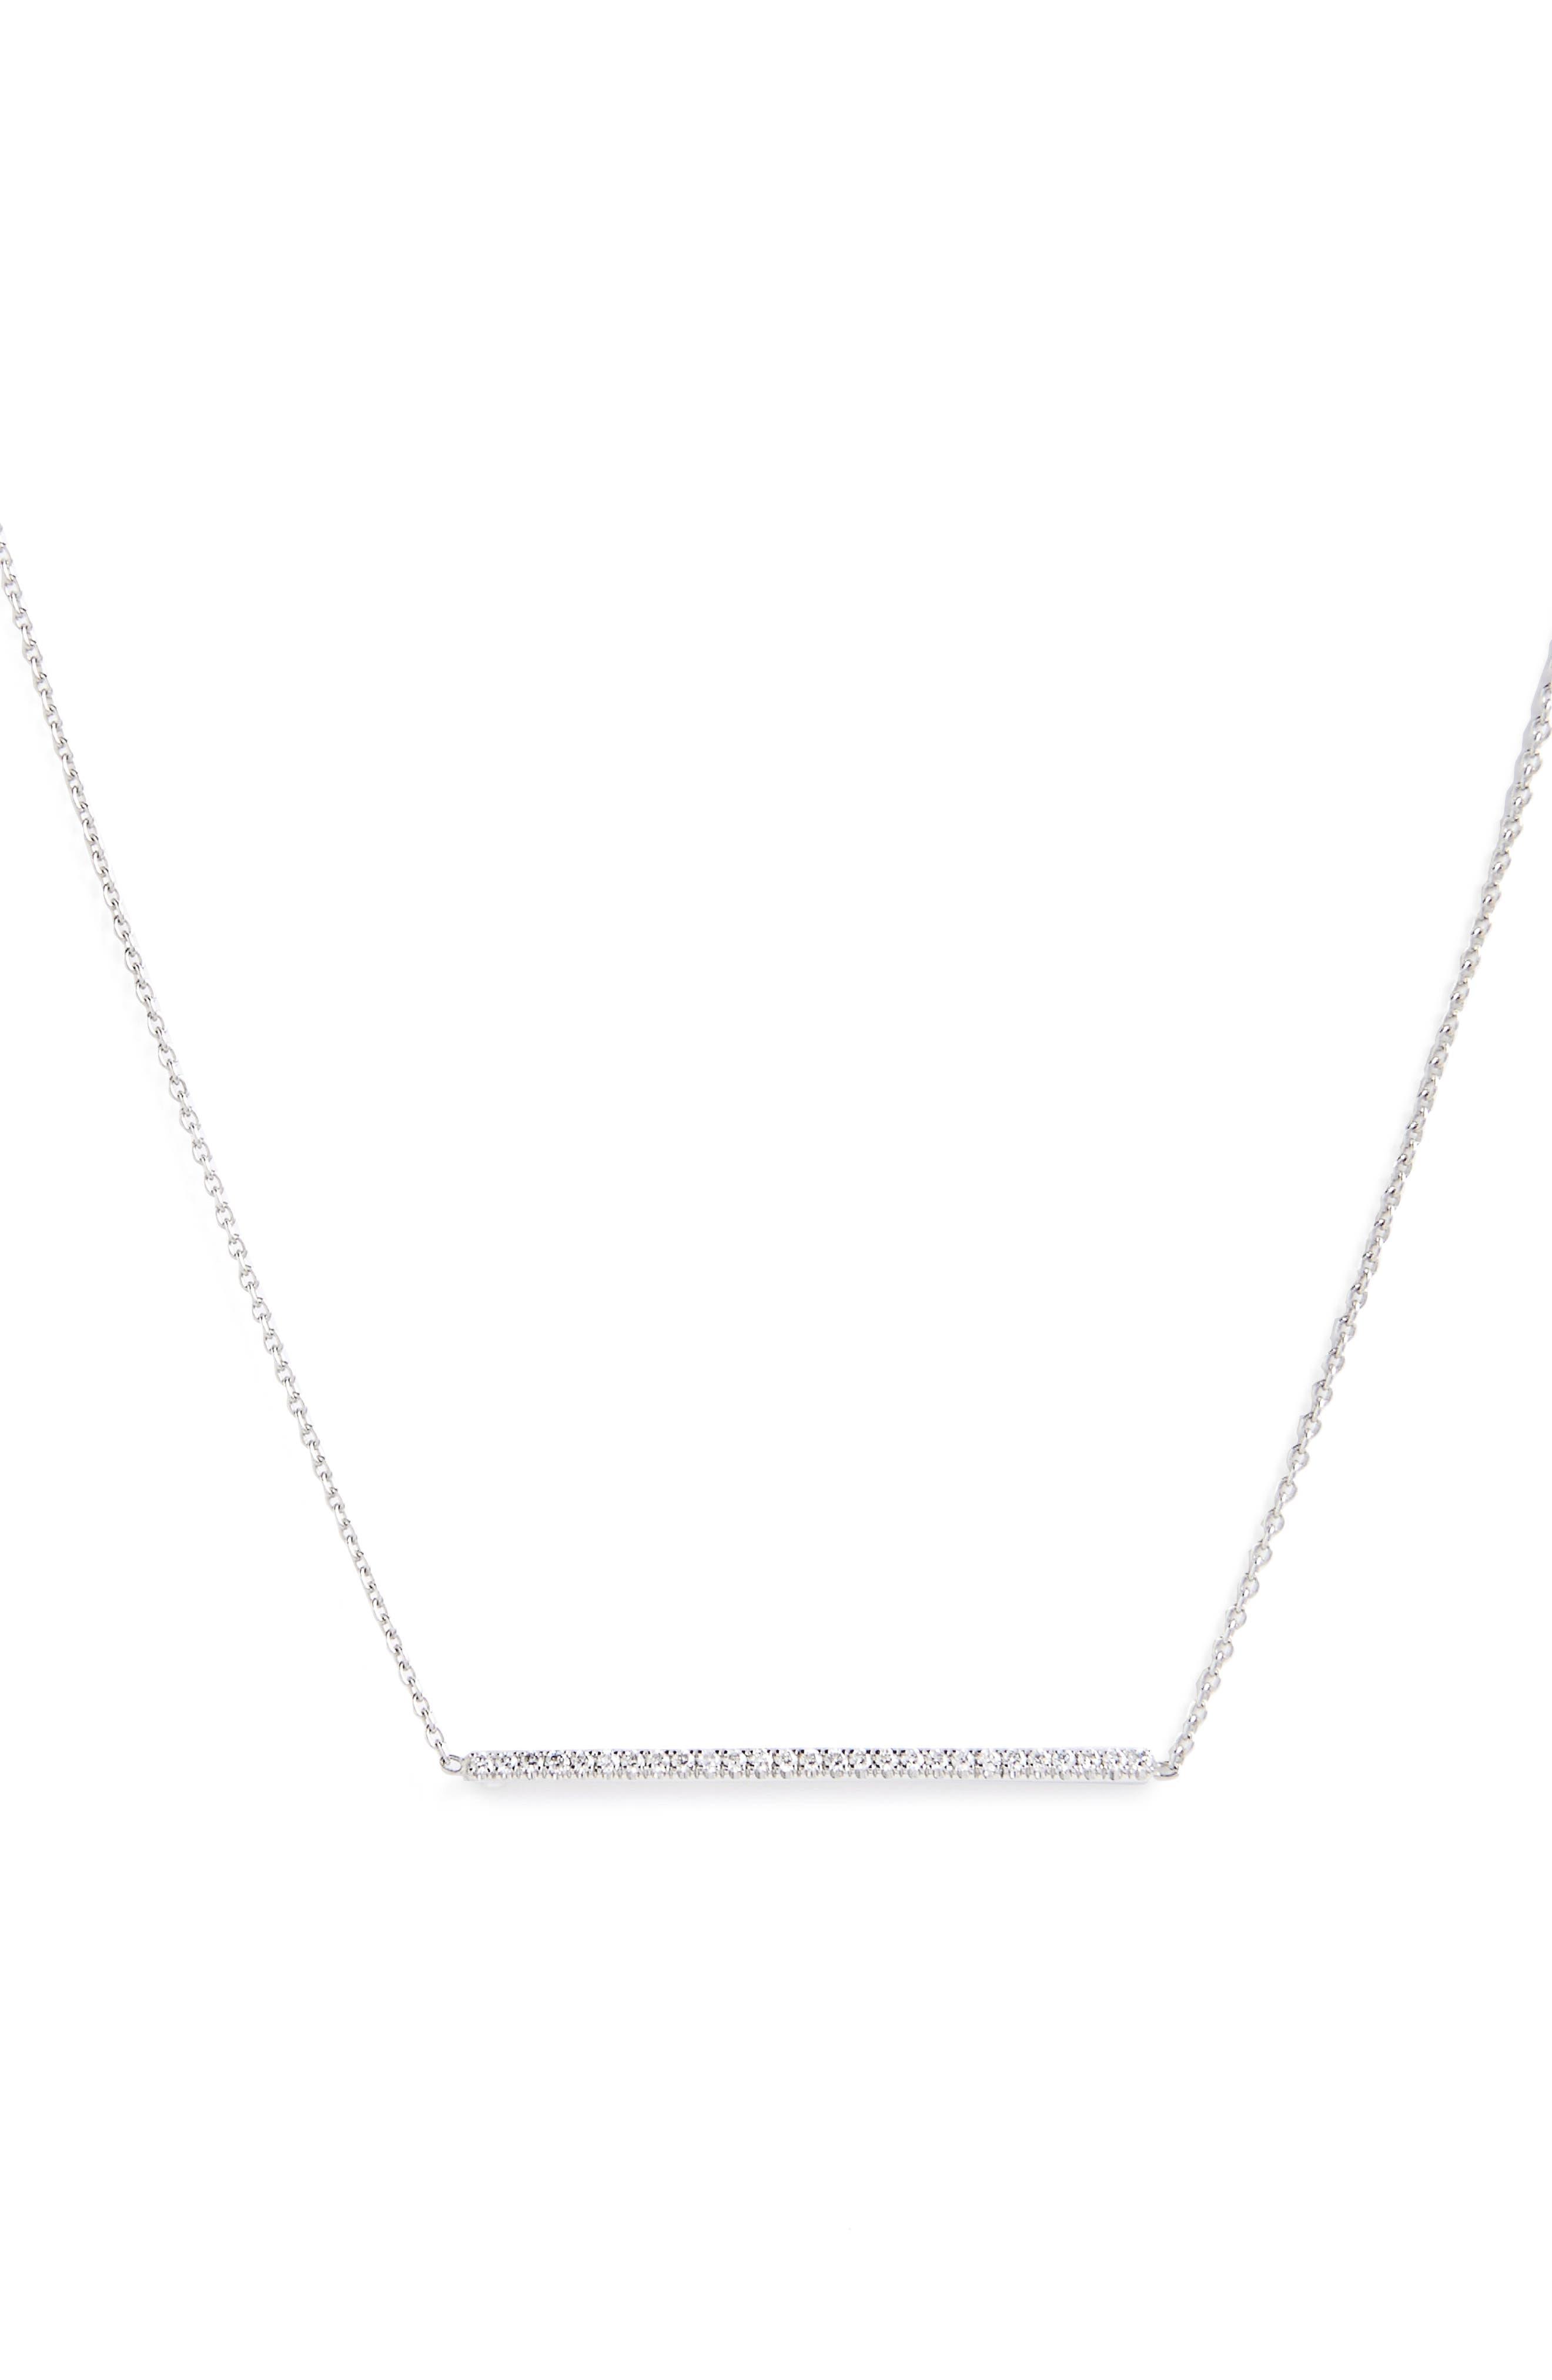 Tiny Treasures Diamond Bar Necklace,                             Main thumbnail 1, color,                             WHITE GOLD